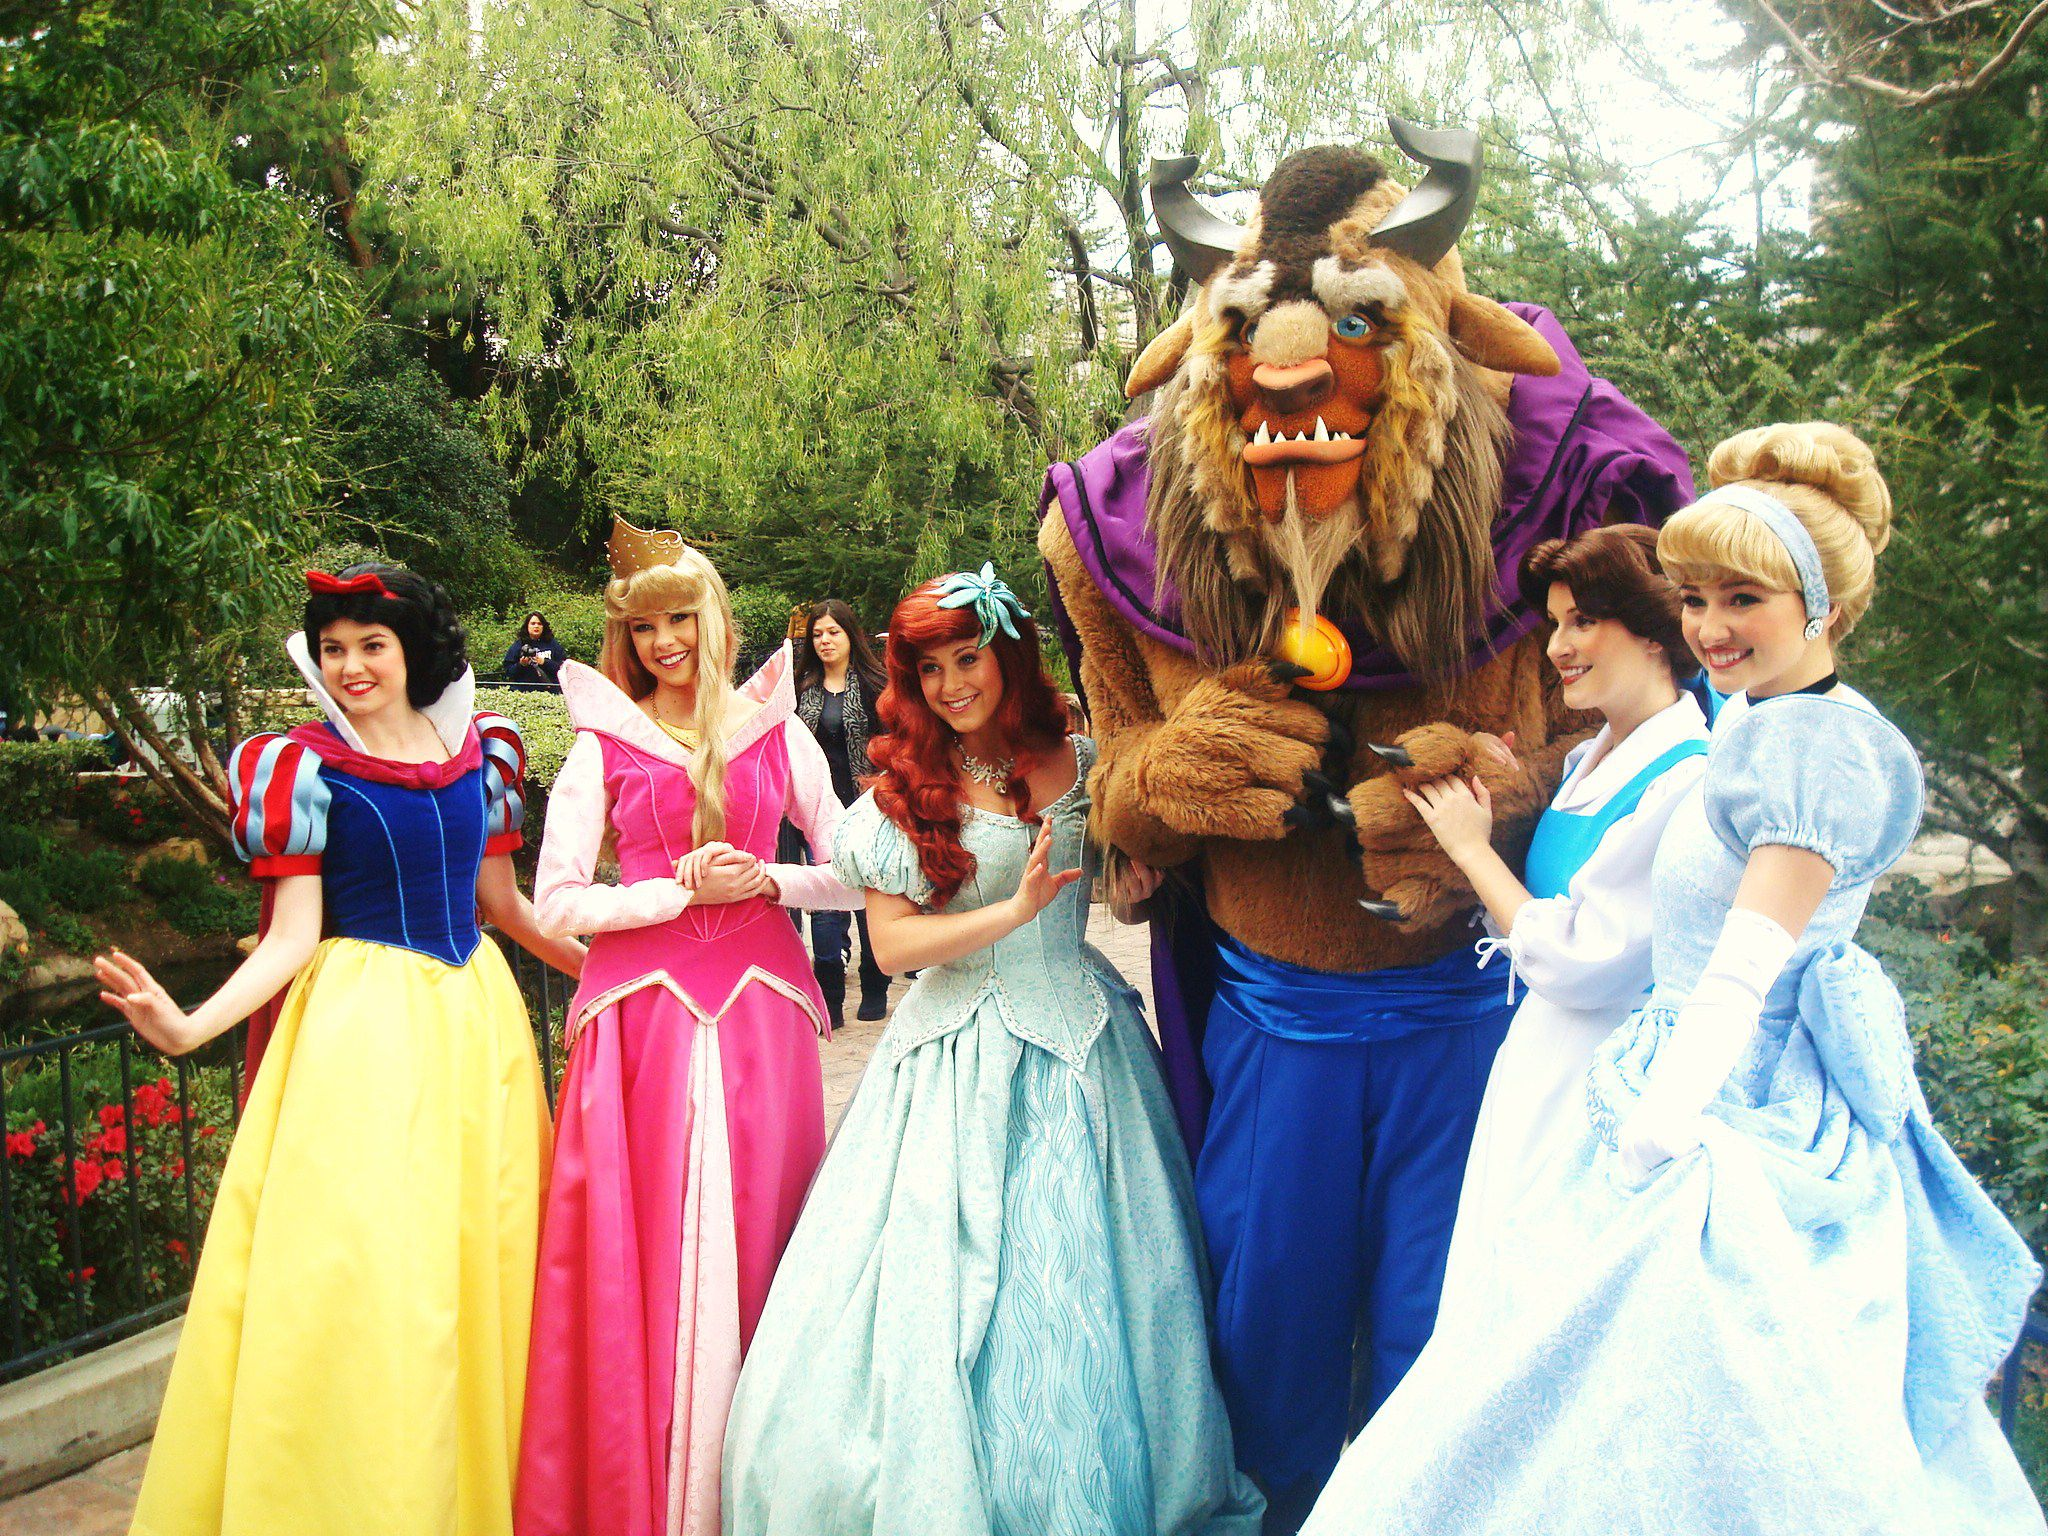 File:Beast and Princesses.jpg